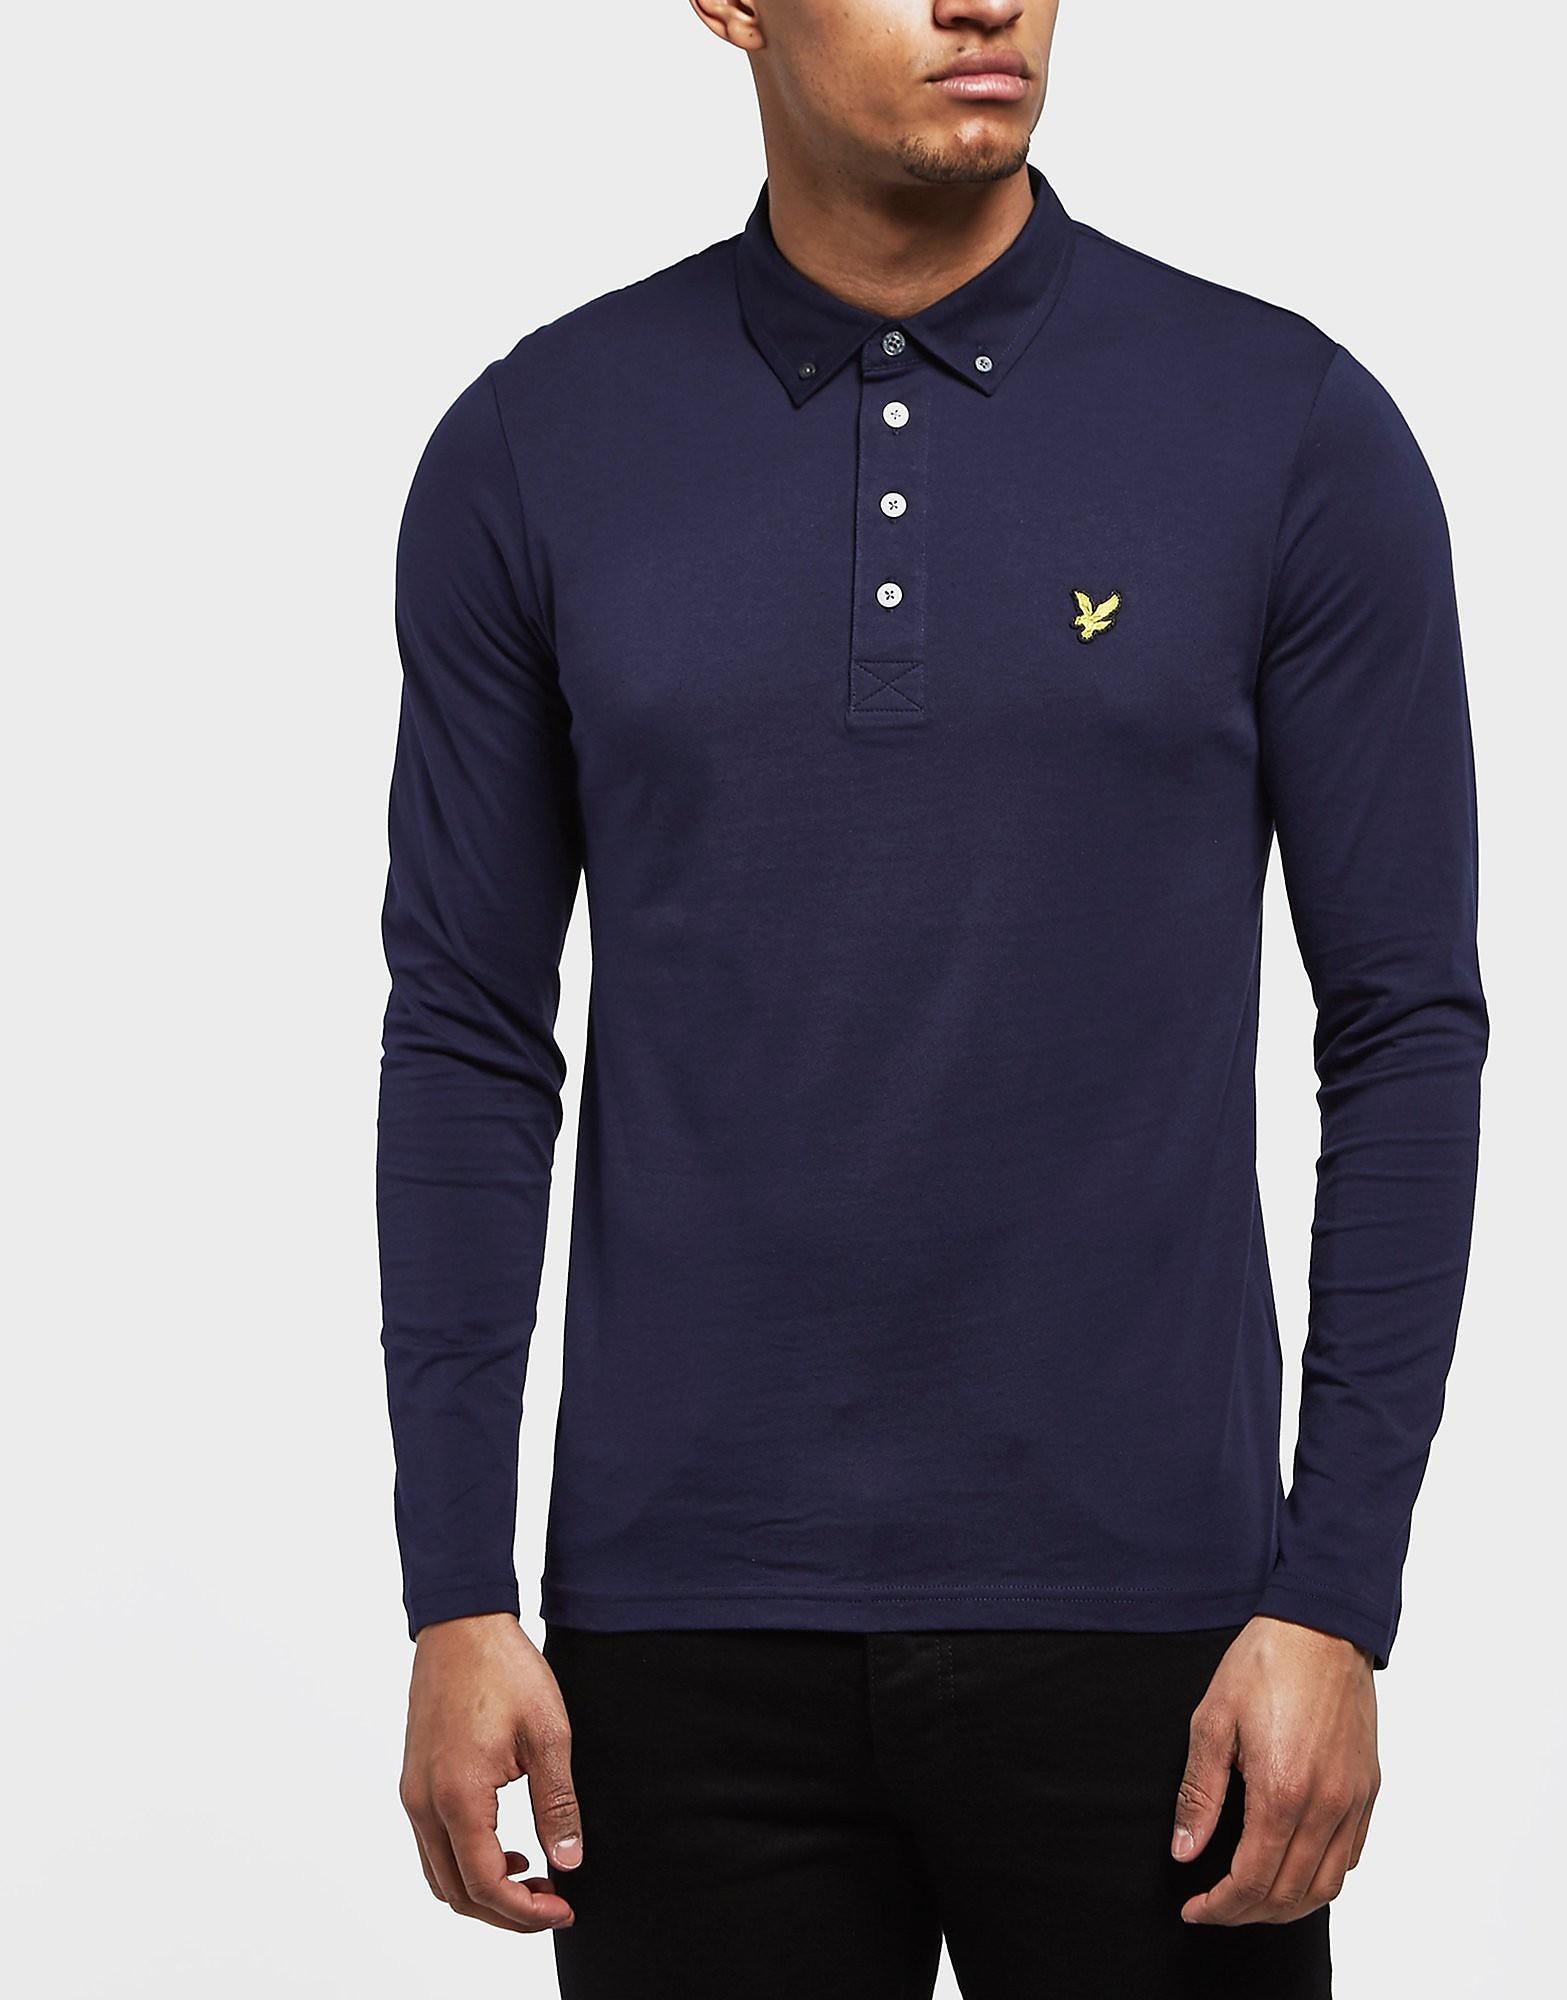 Lyle & Scott Woven Collar Long Sleeve Polo Shirt